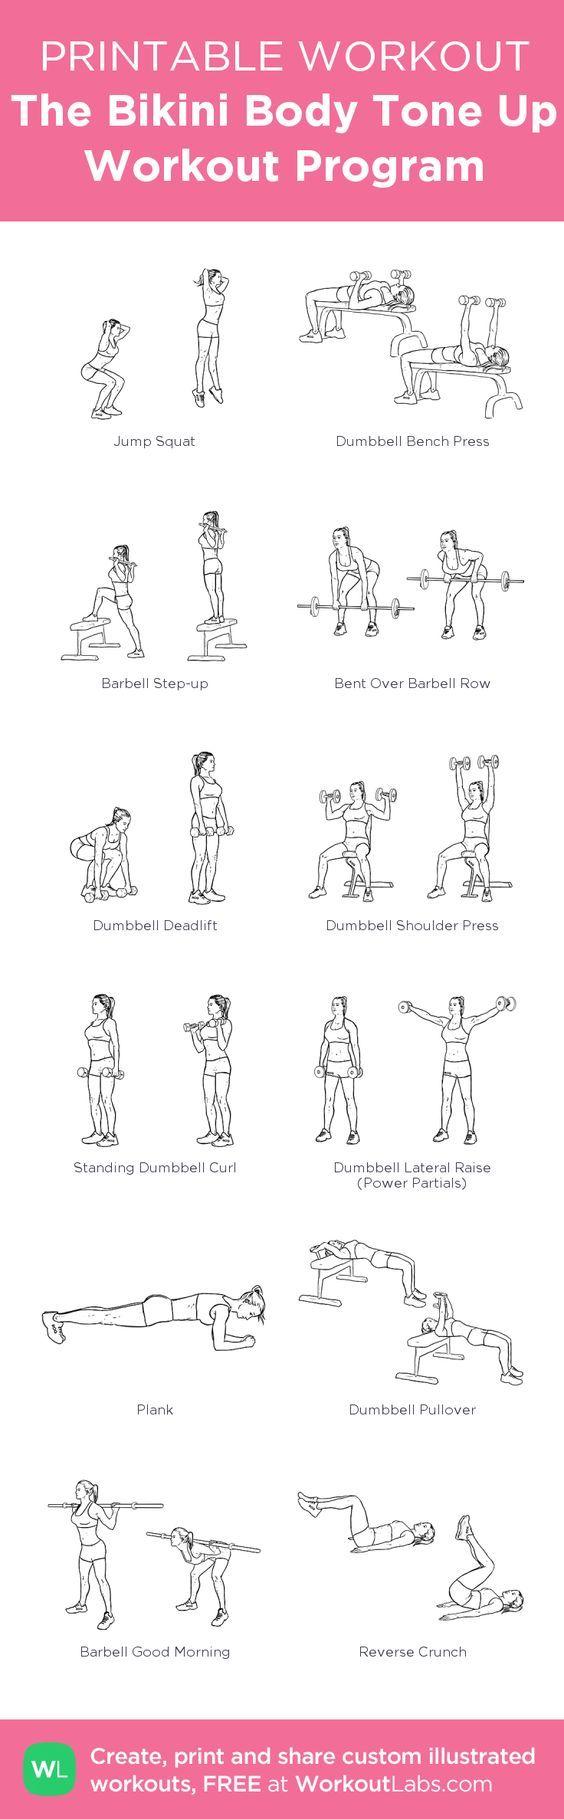 The Bikini Body Tone Up Workout Program:my custom printable workout by @WorkoutLabs #workoutlabs #customworkout: